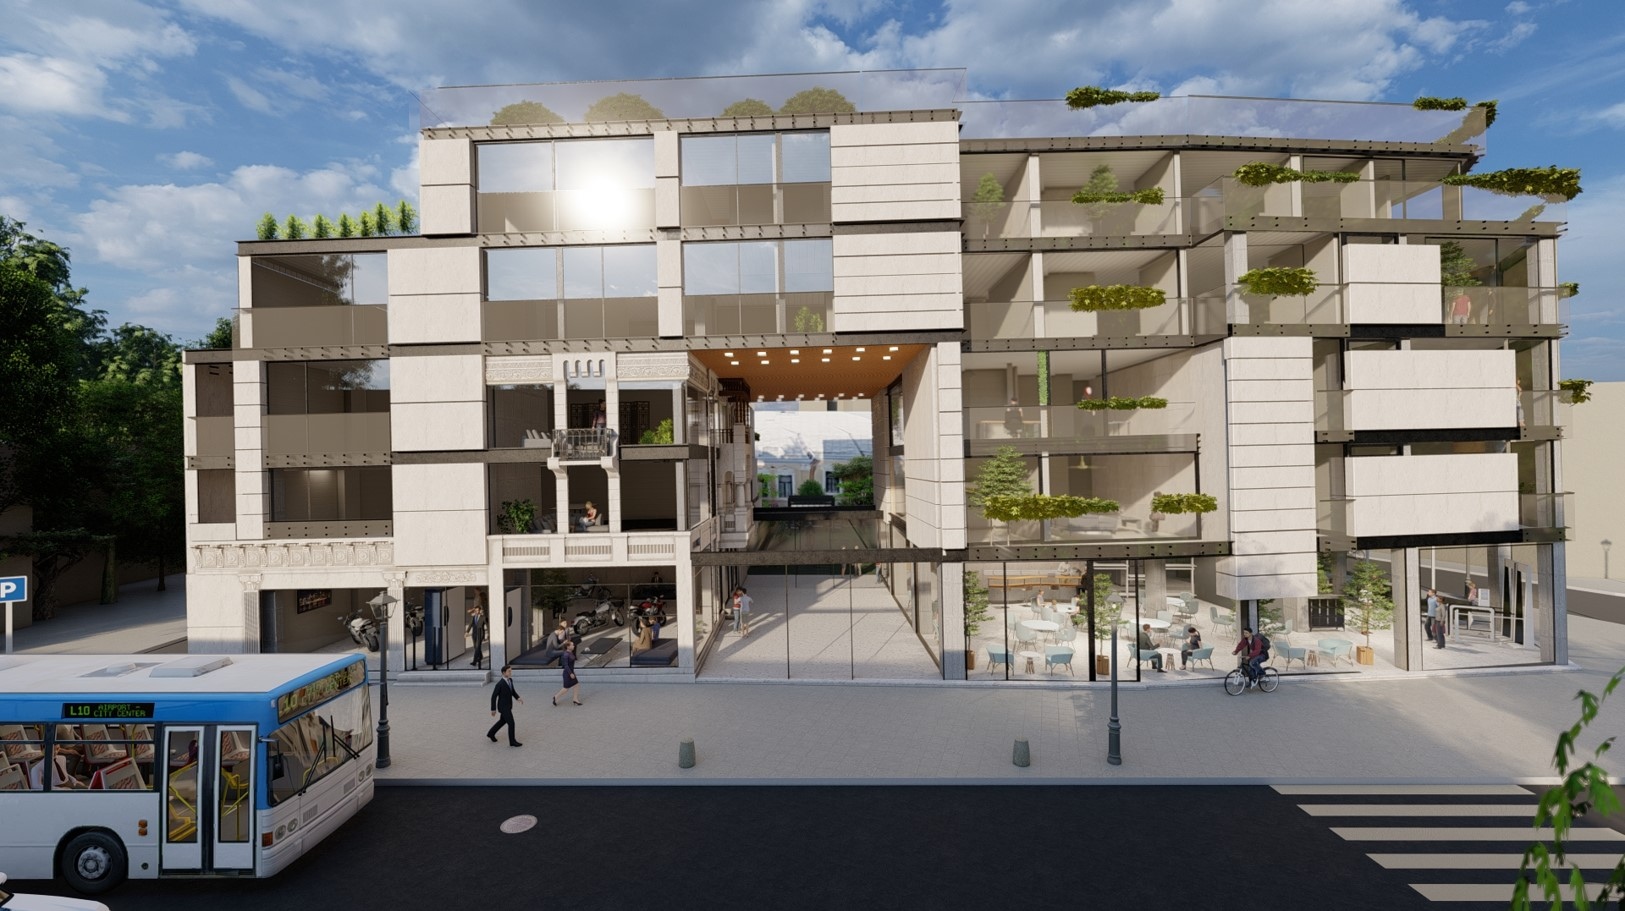 proiectul dezvoltat pe strada Icoanei